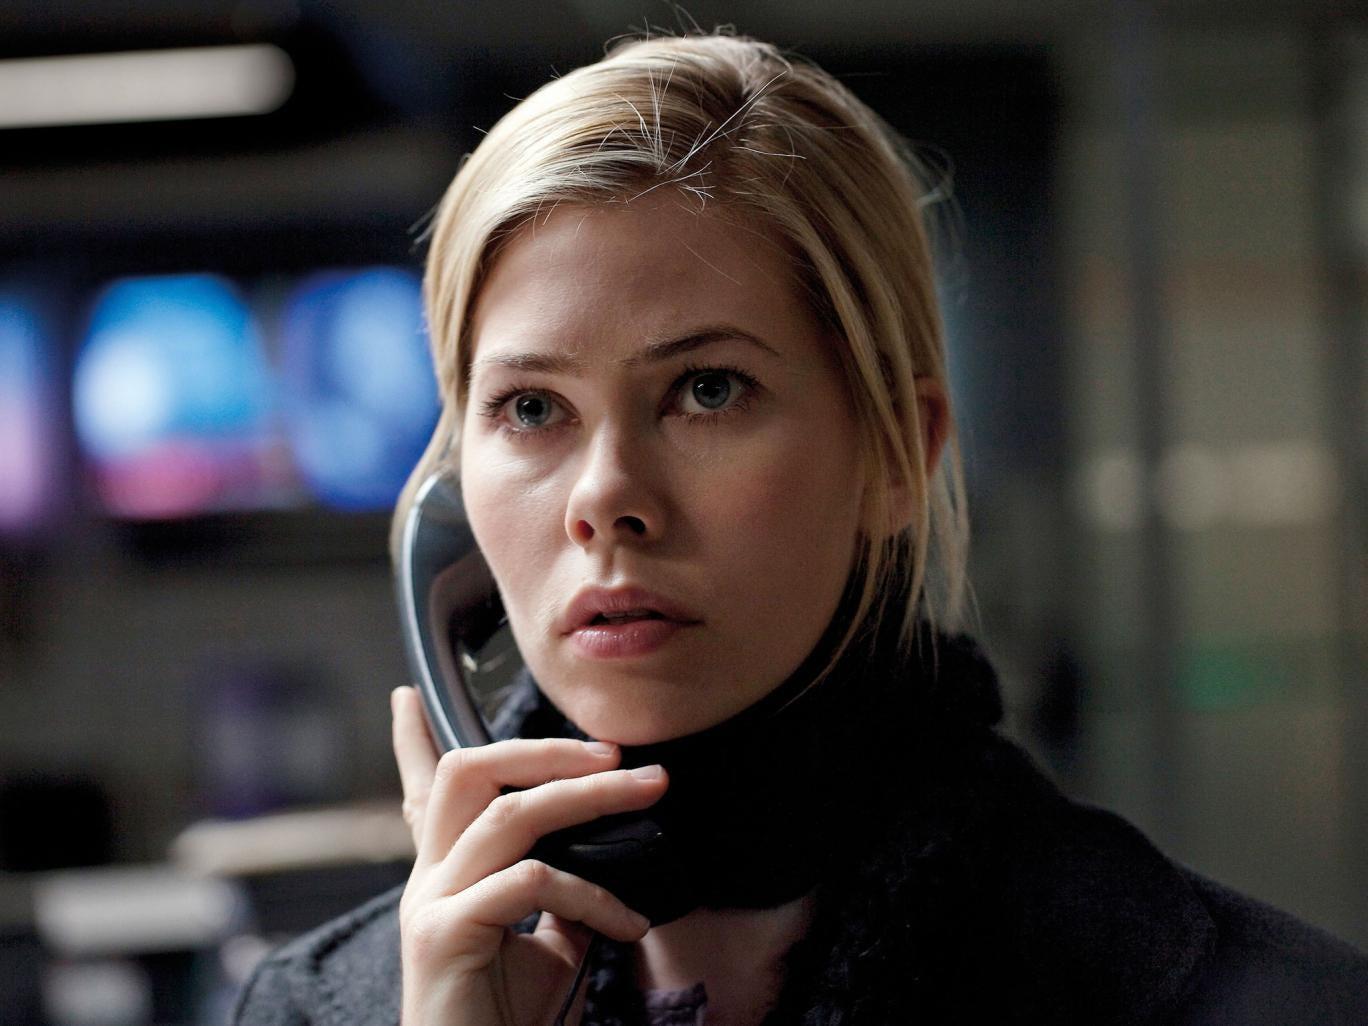 Birgitte Hjort Sorensen in the series as Fonsmark